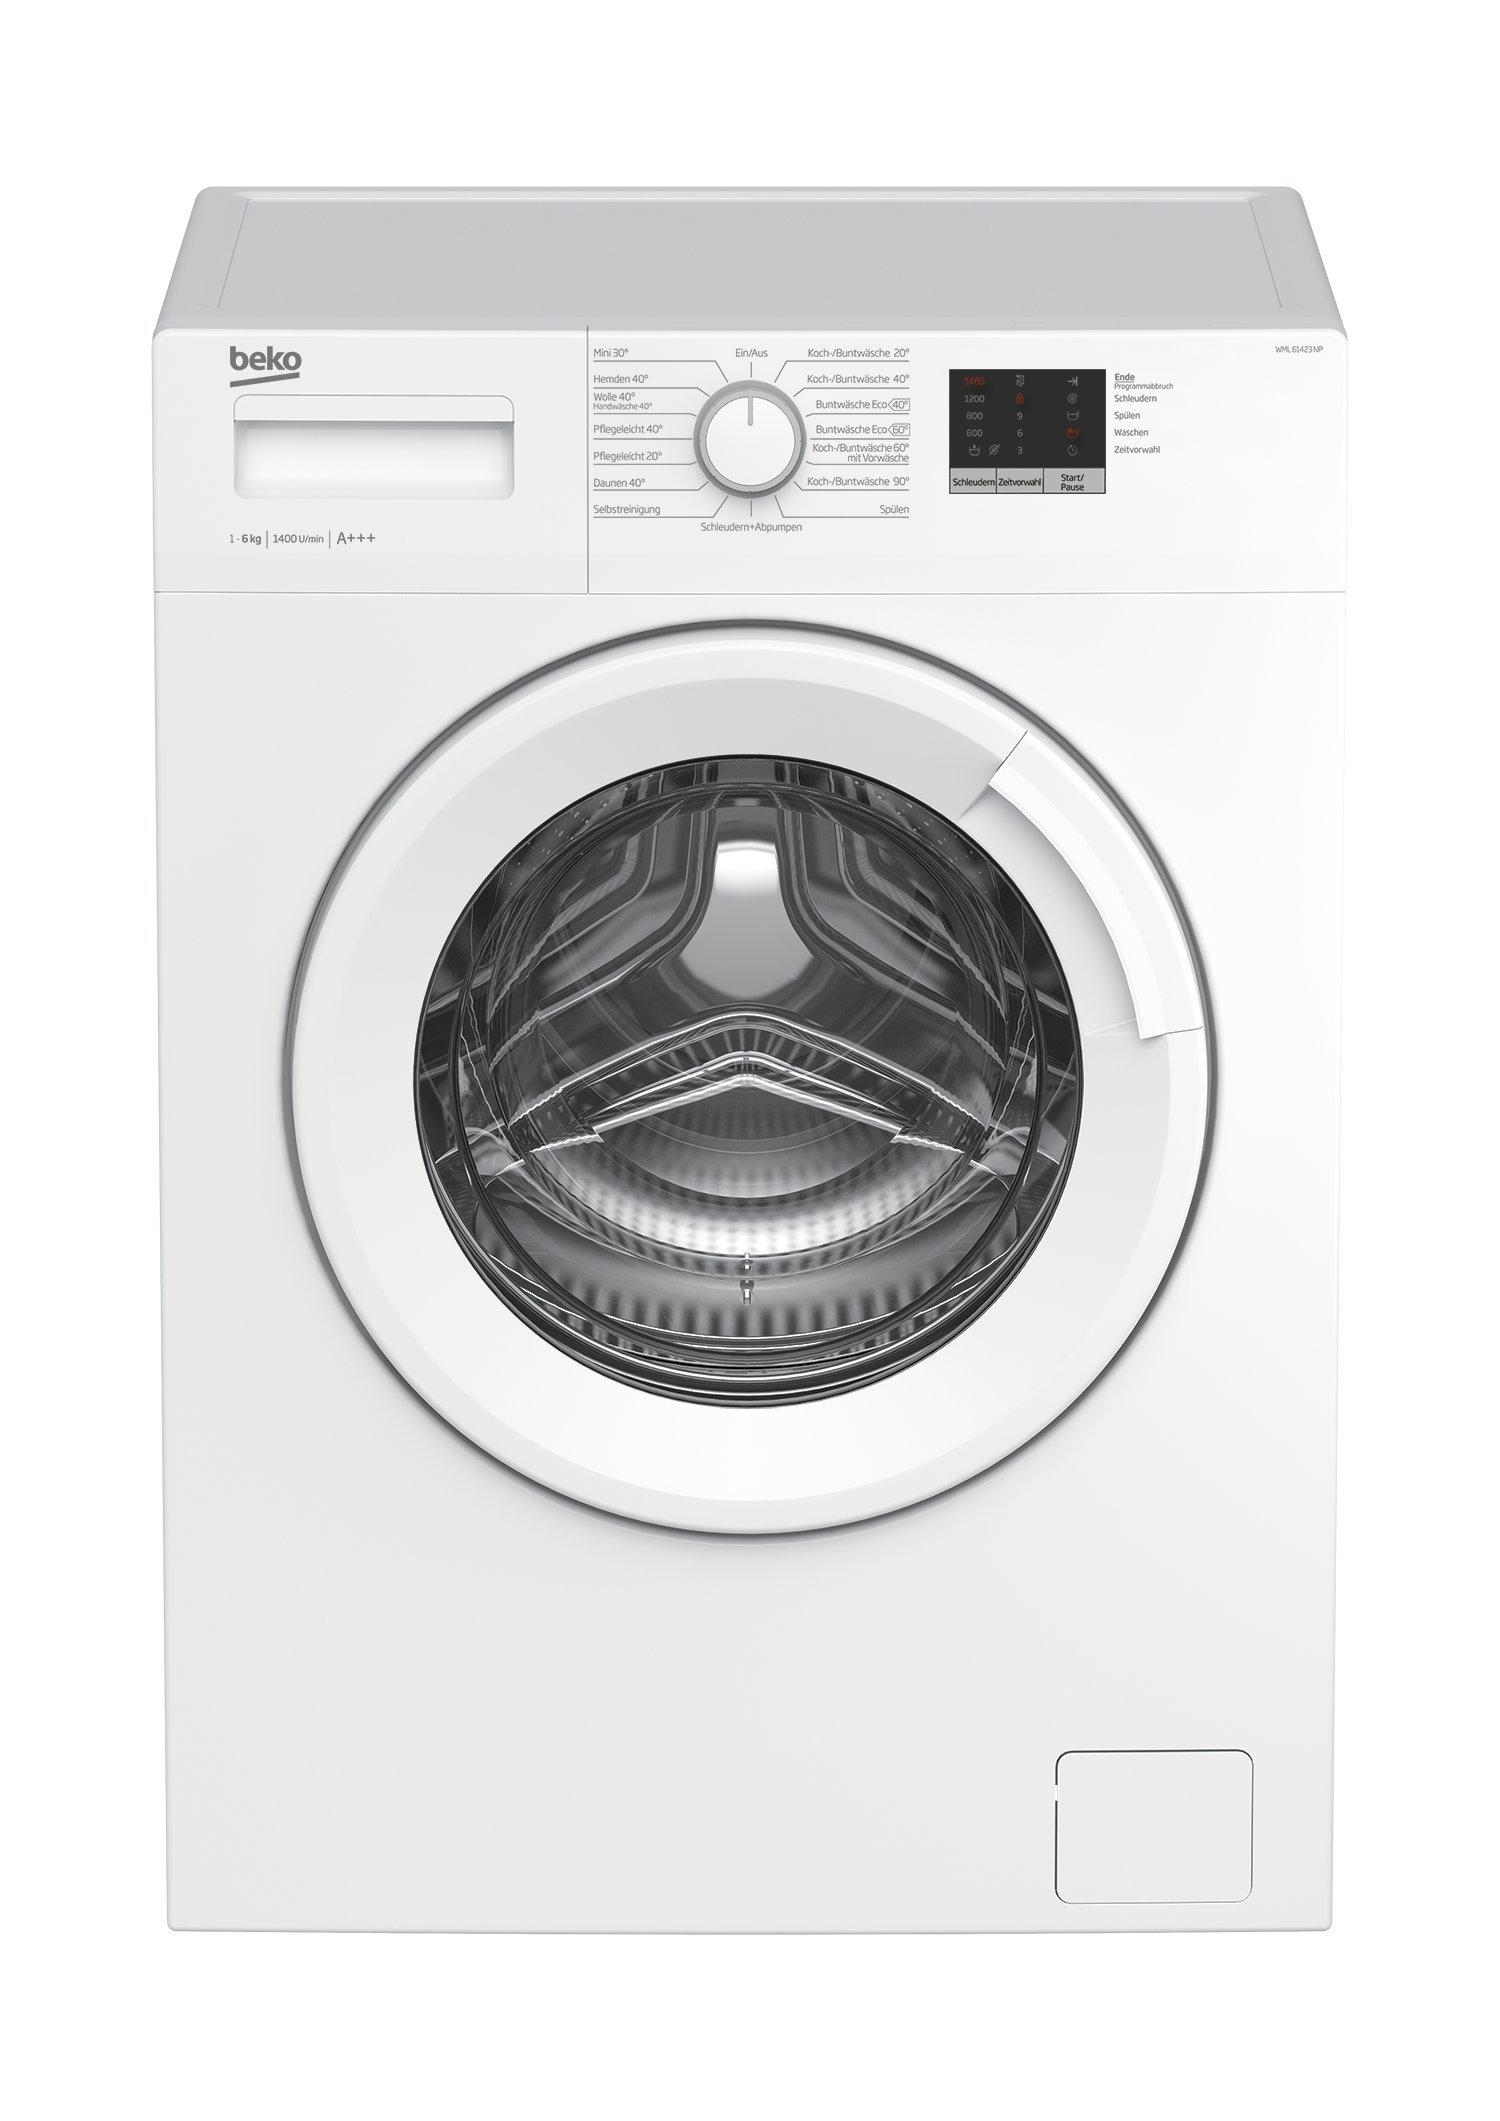 Beko-WML-61423-N-Waschmaschine-Frontlader-6kg-A-1400-UpM-Mengenautomatik-wei-15-Programme-Express-Programm-30-Minuten-elektronische-Kindersicherung